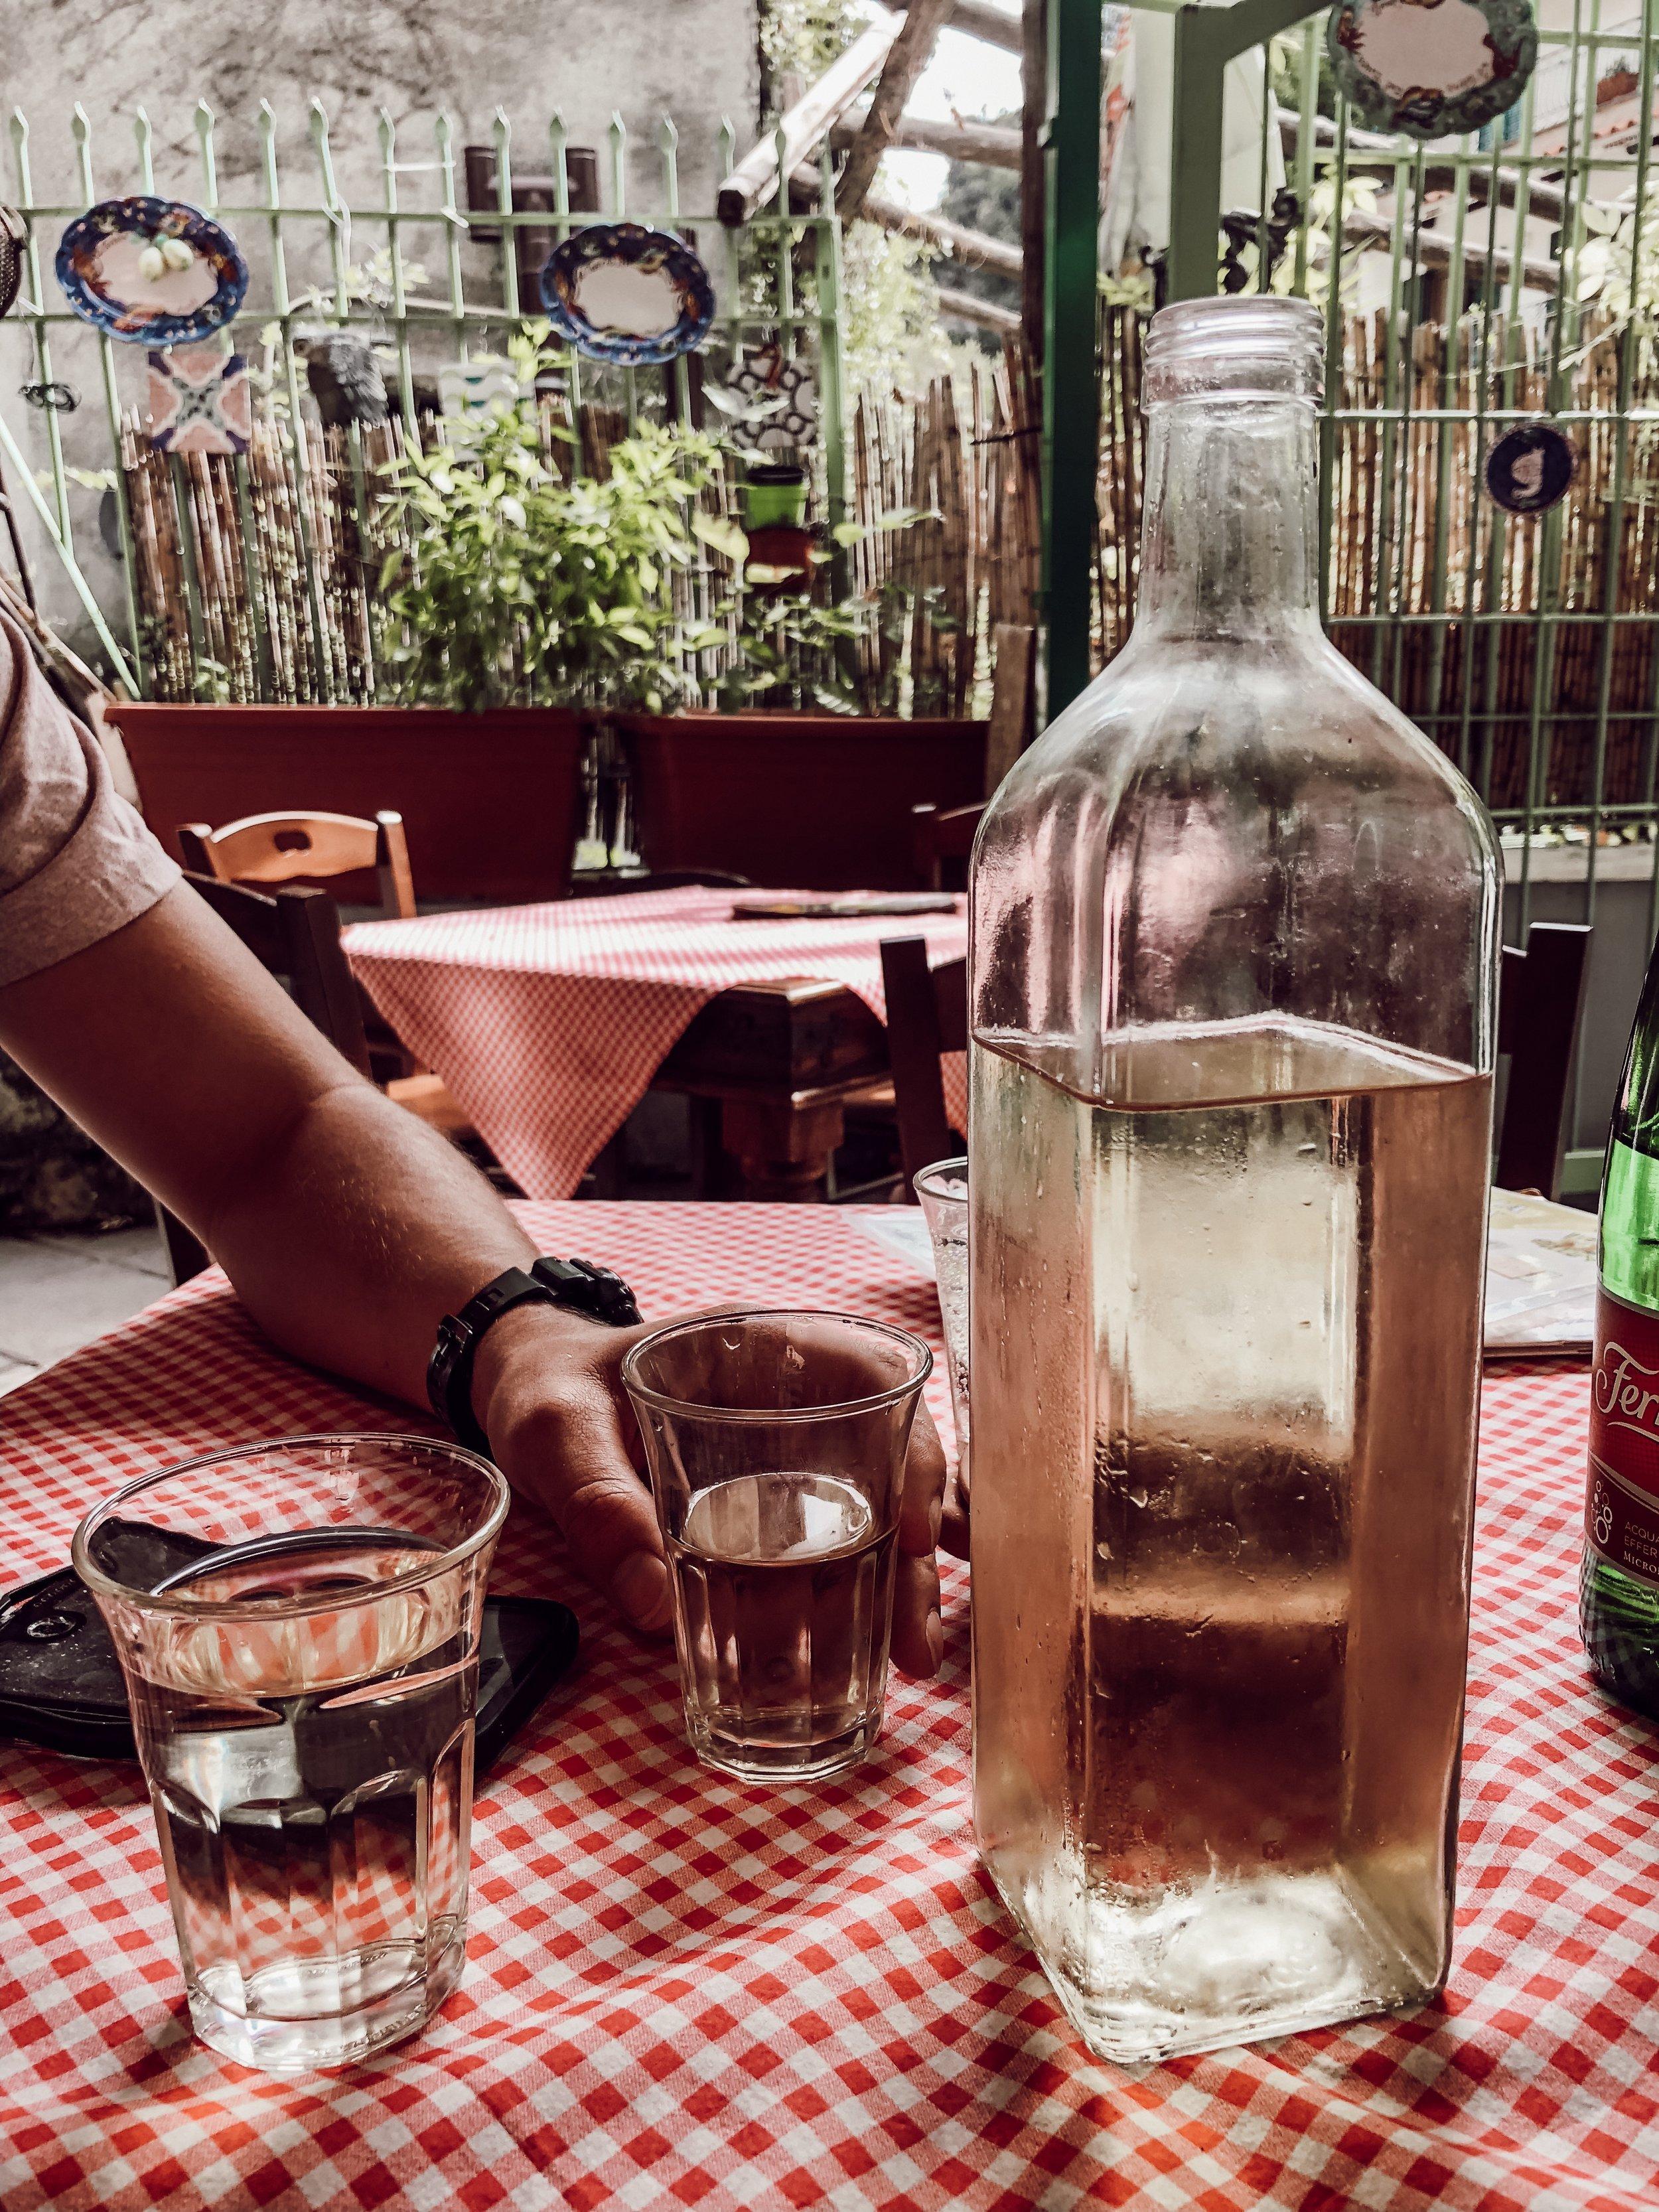 Homemade Wine Amalfi Italy | Three Days on the Amalfi Coast, Amalfi Travel Guide, What to Do in Amalfi Italy | Miranda Schroeder Blog